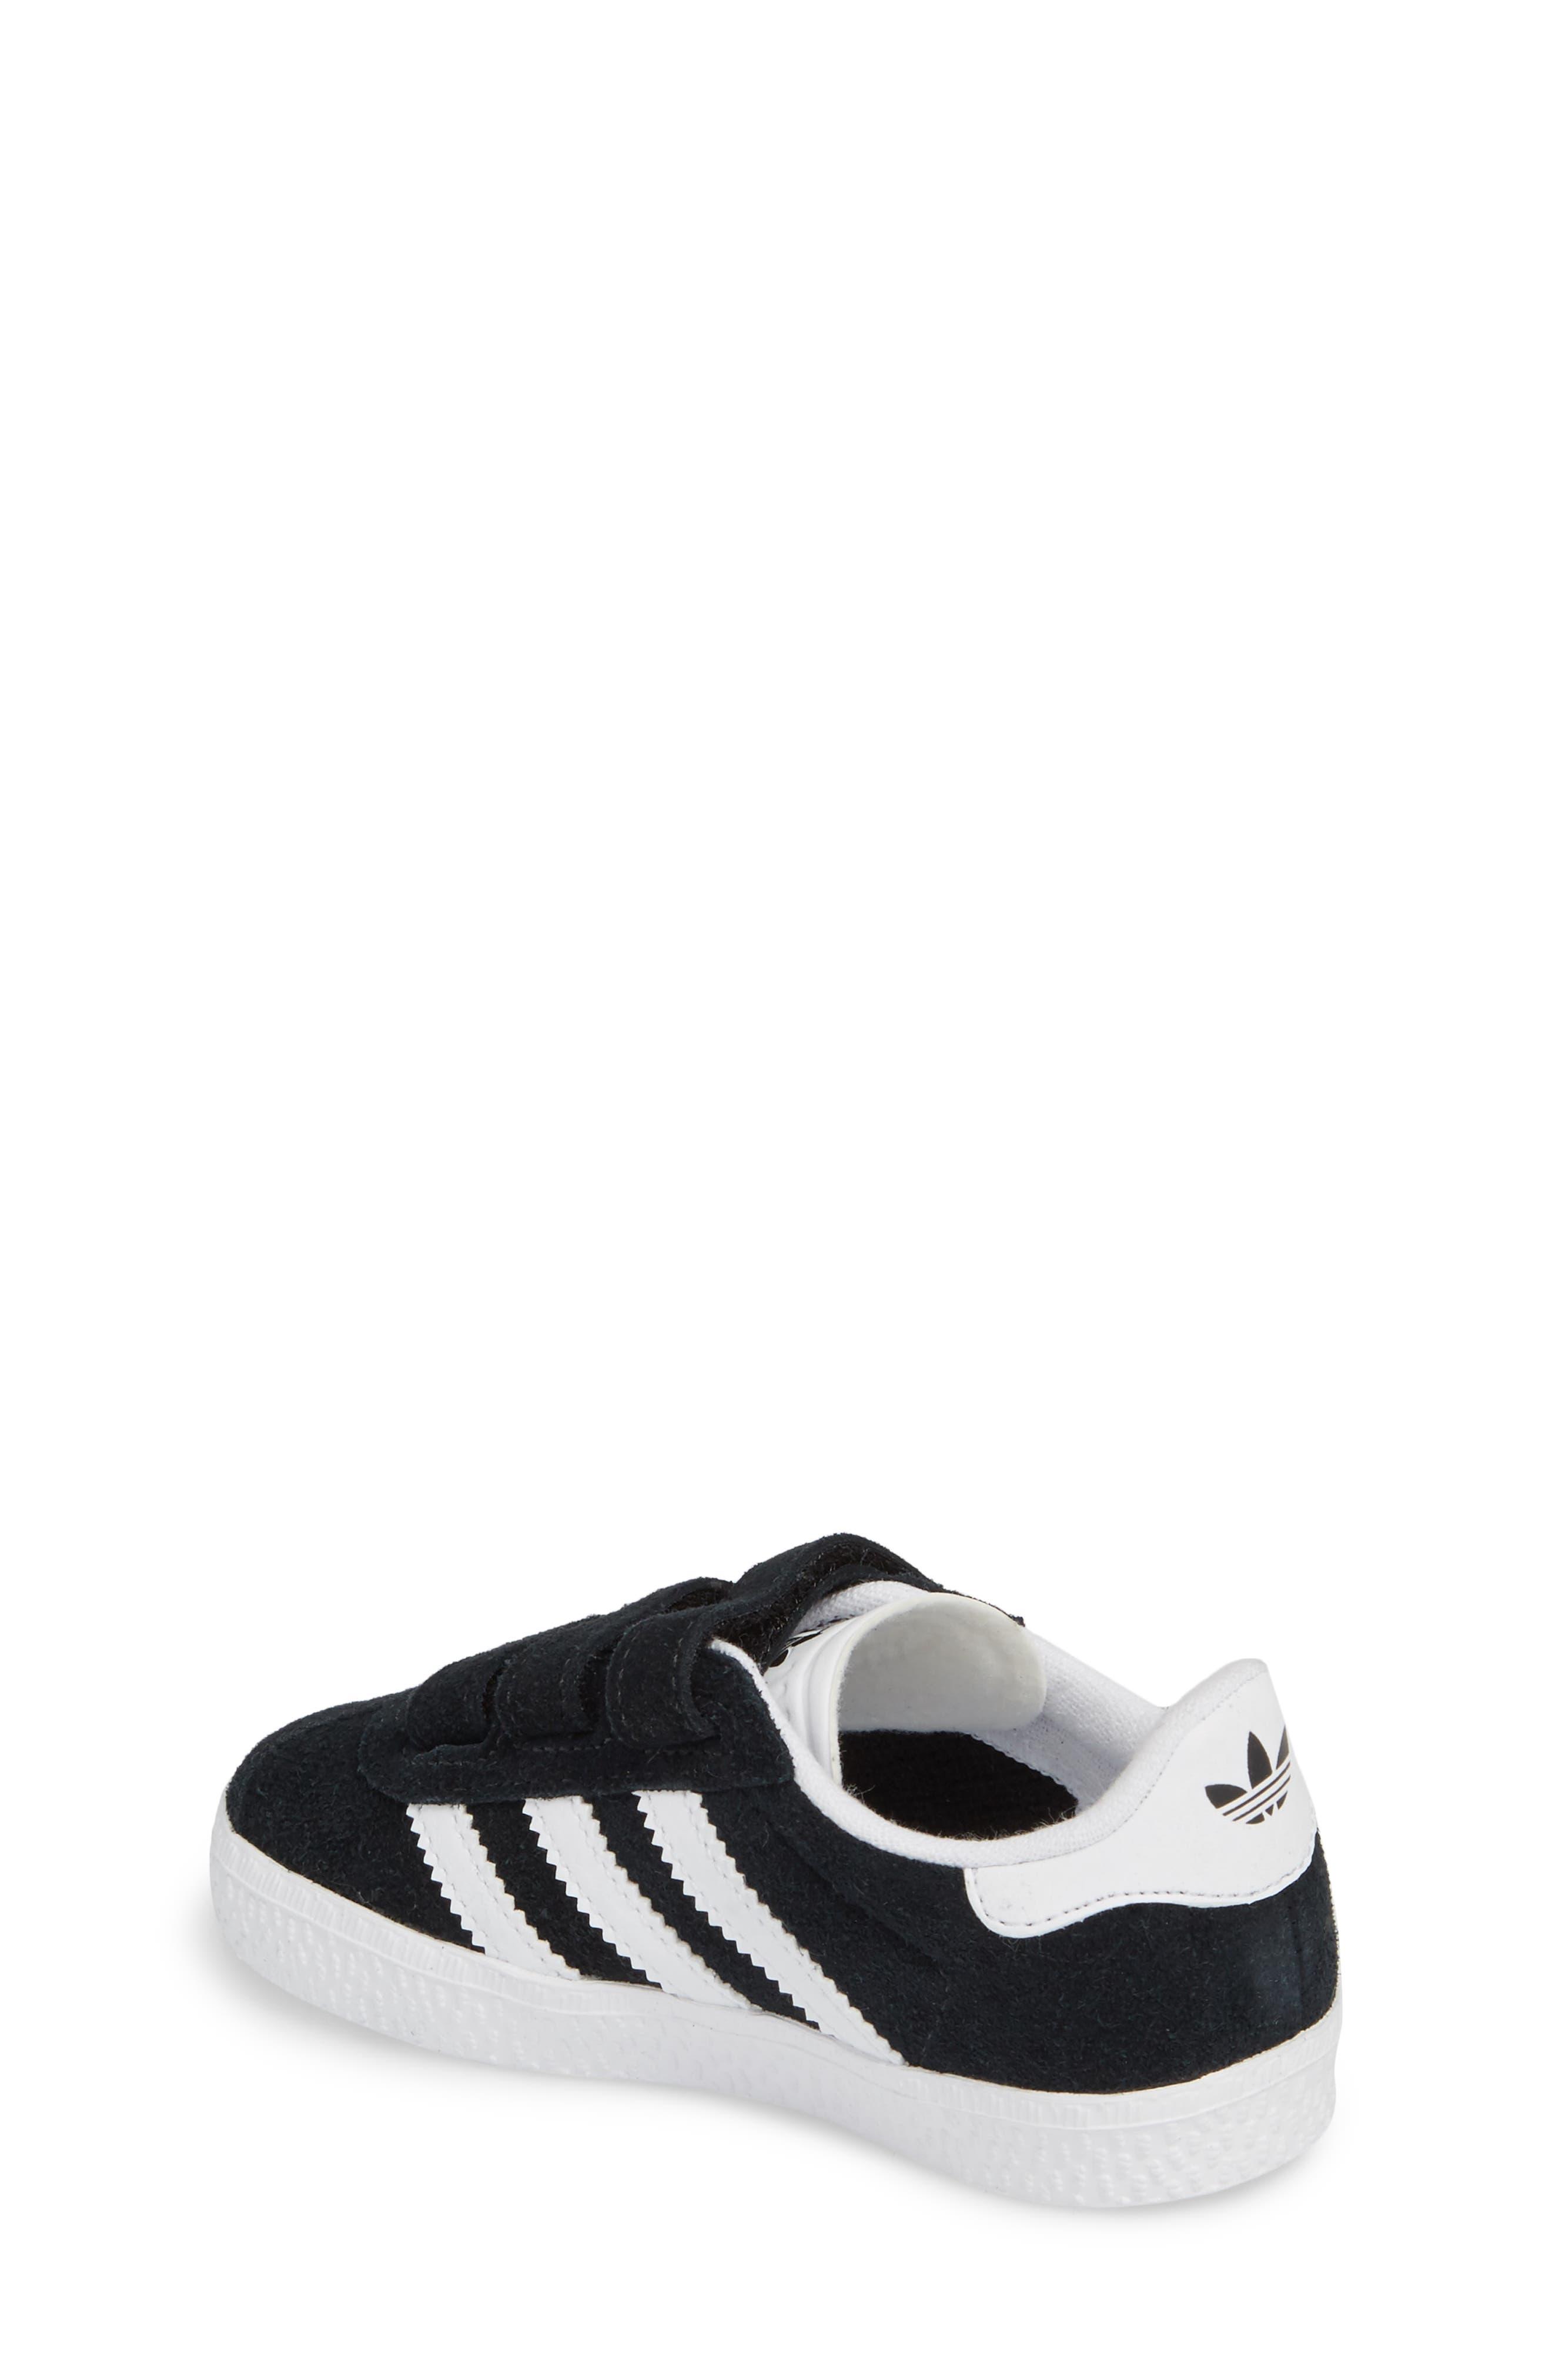 Gazelle Sneaker,                             Alternate thumbnail 3, color,                             Core Black / White / White